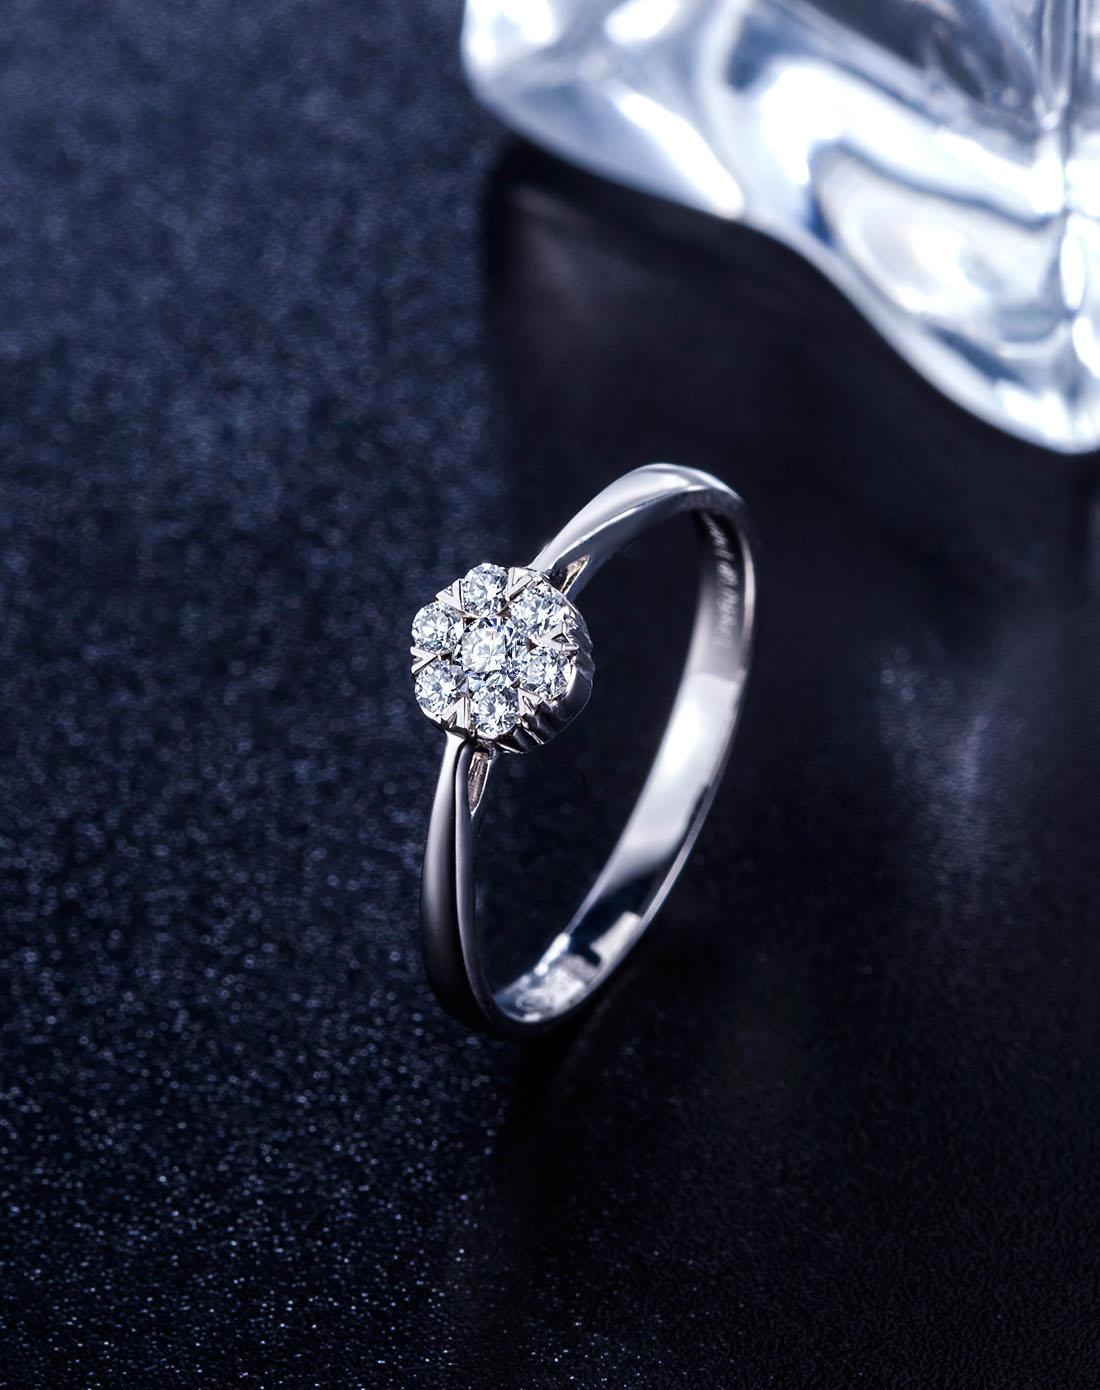 18k白金豪华群镶钻石戒指